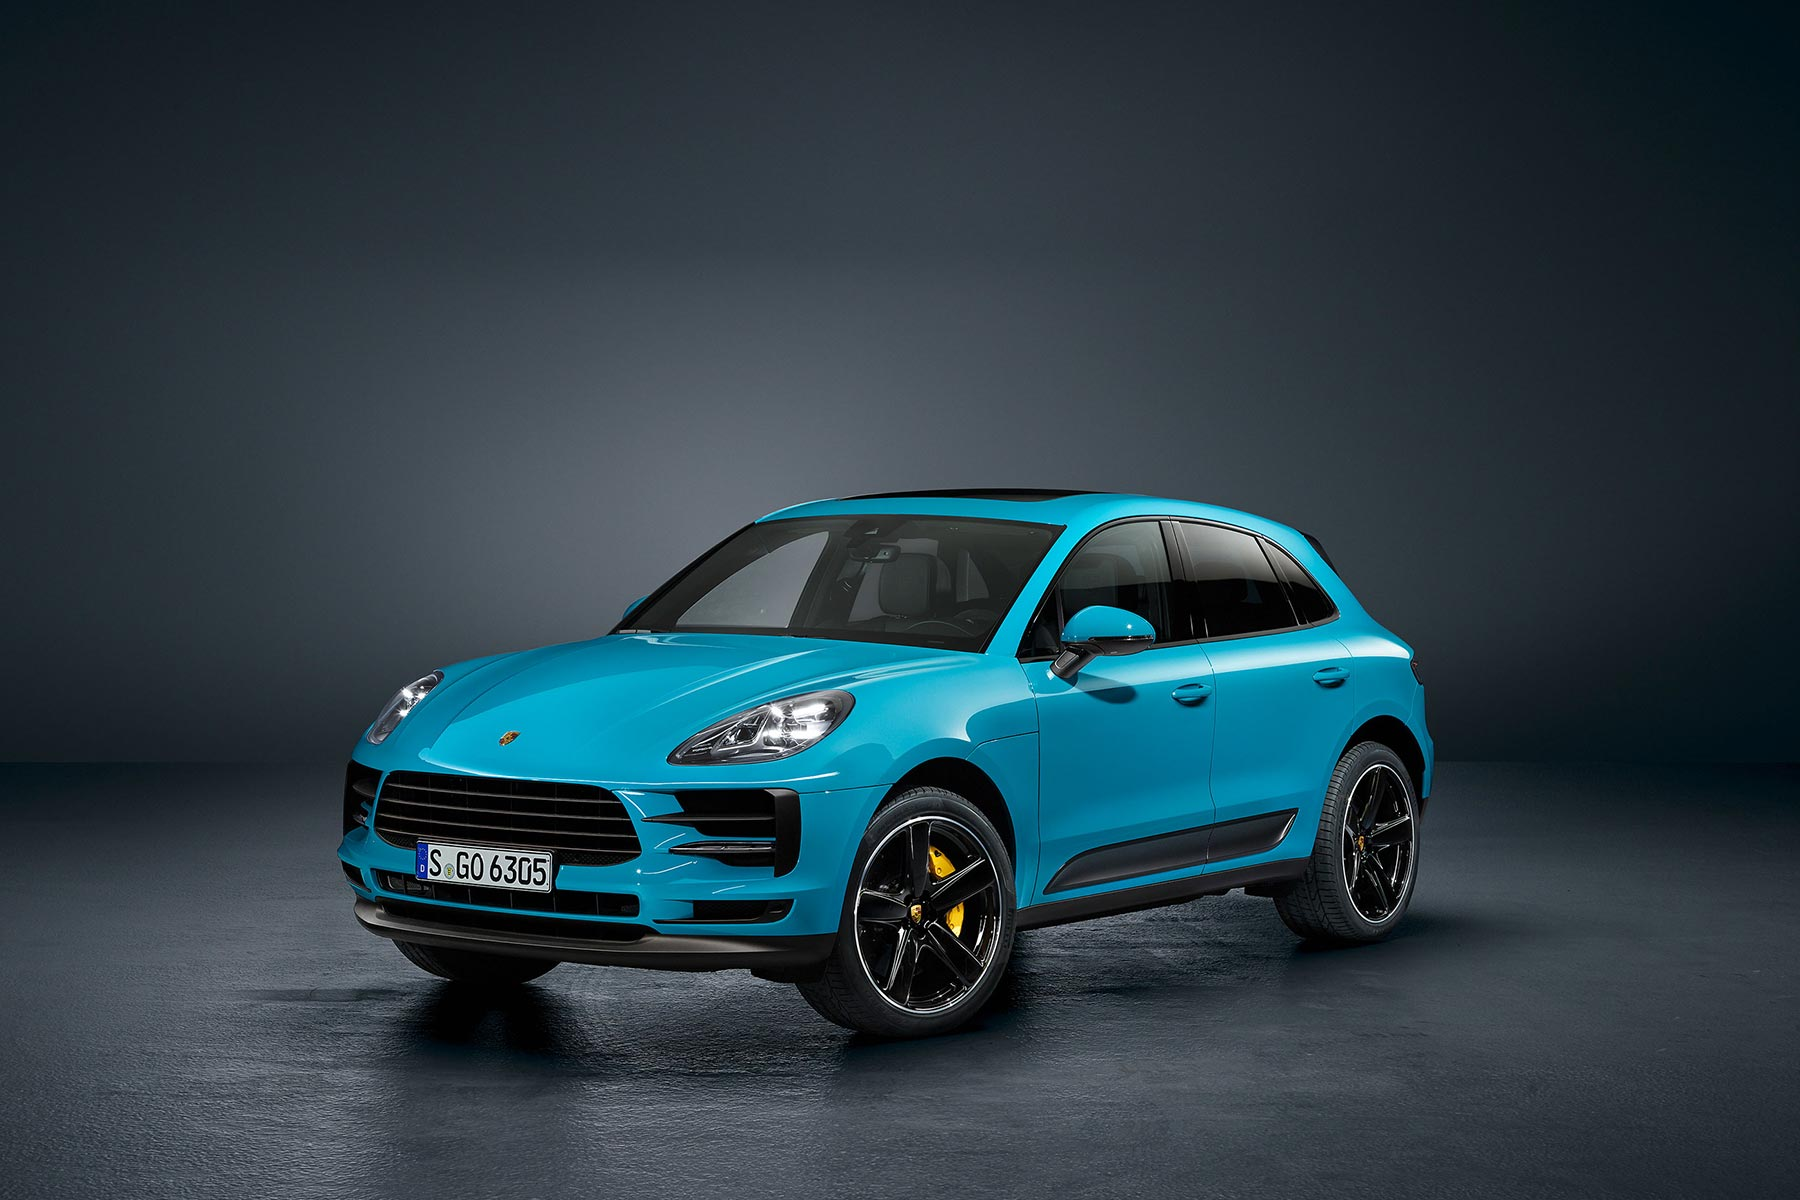 Porsche macan hybrid release date